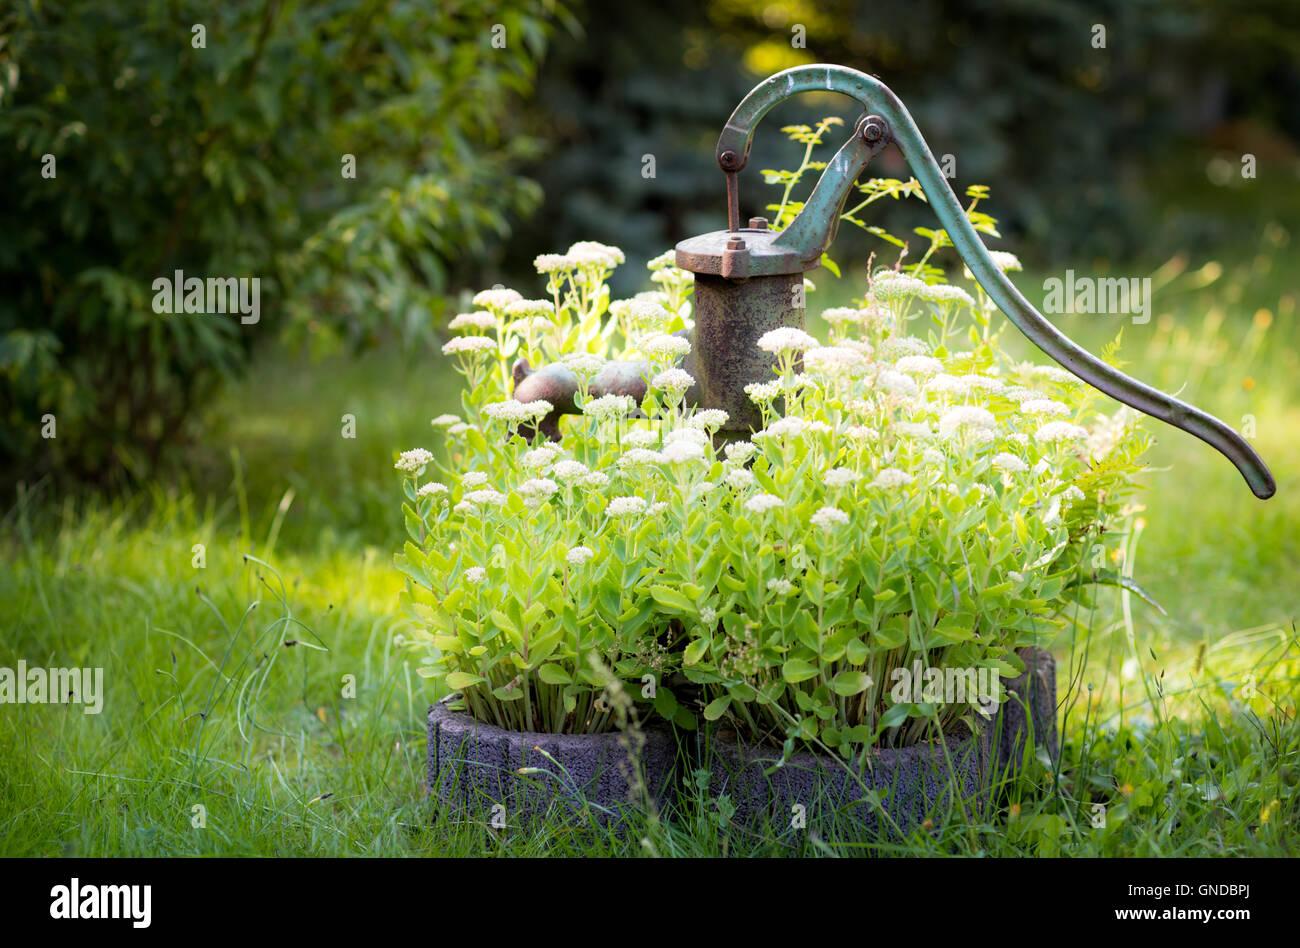 Wasserpumpe Garten Montenegro